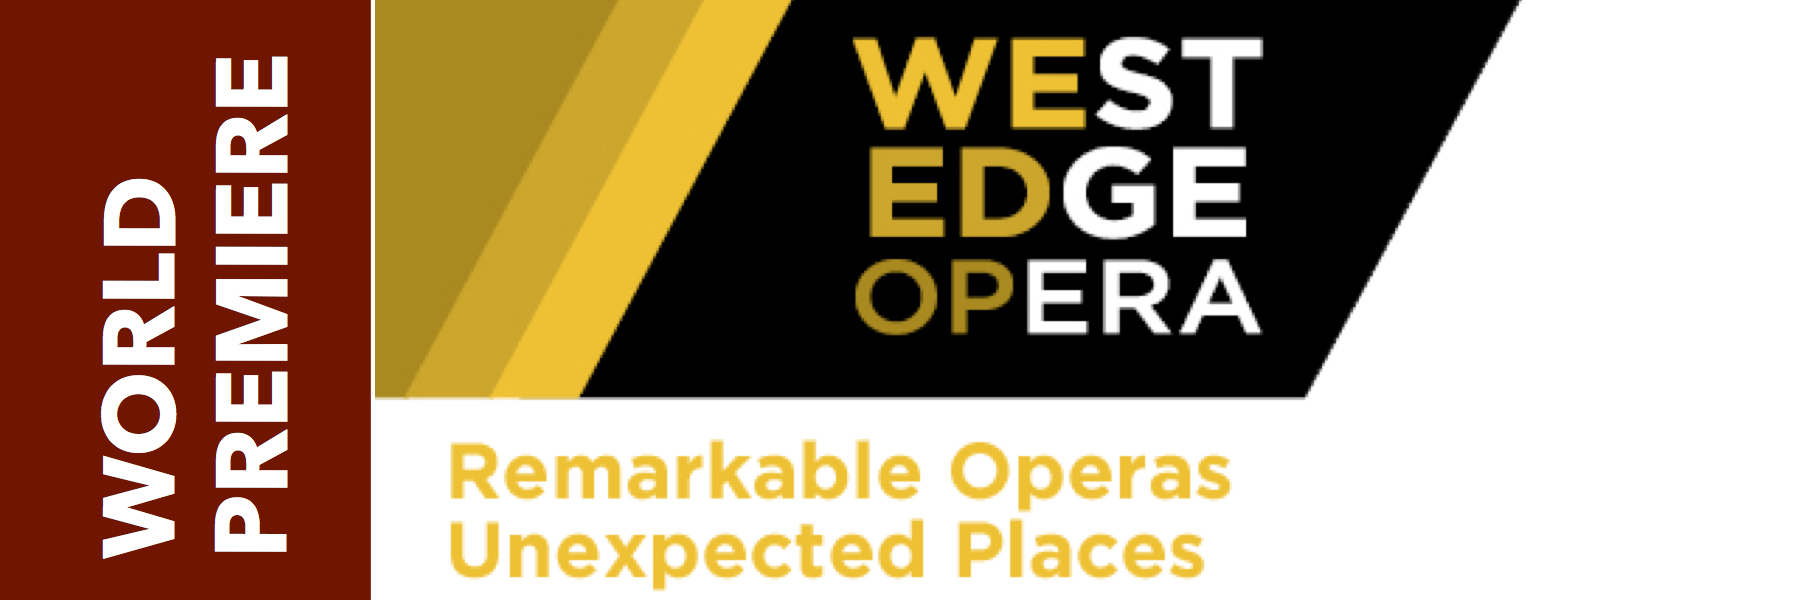 WestEdgeOpera.jpg